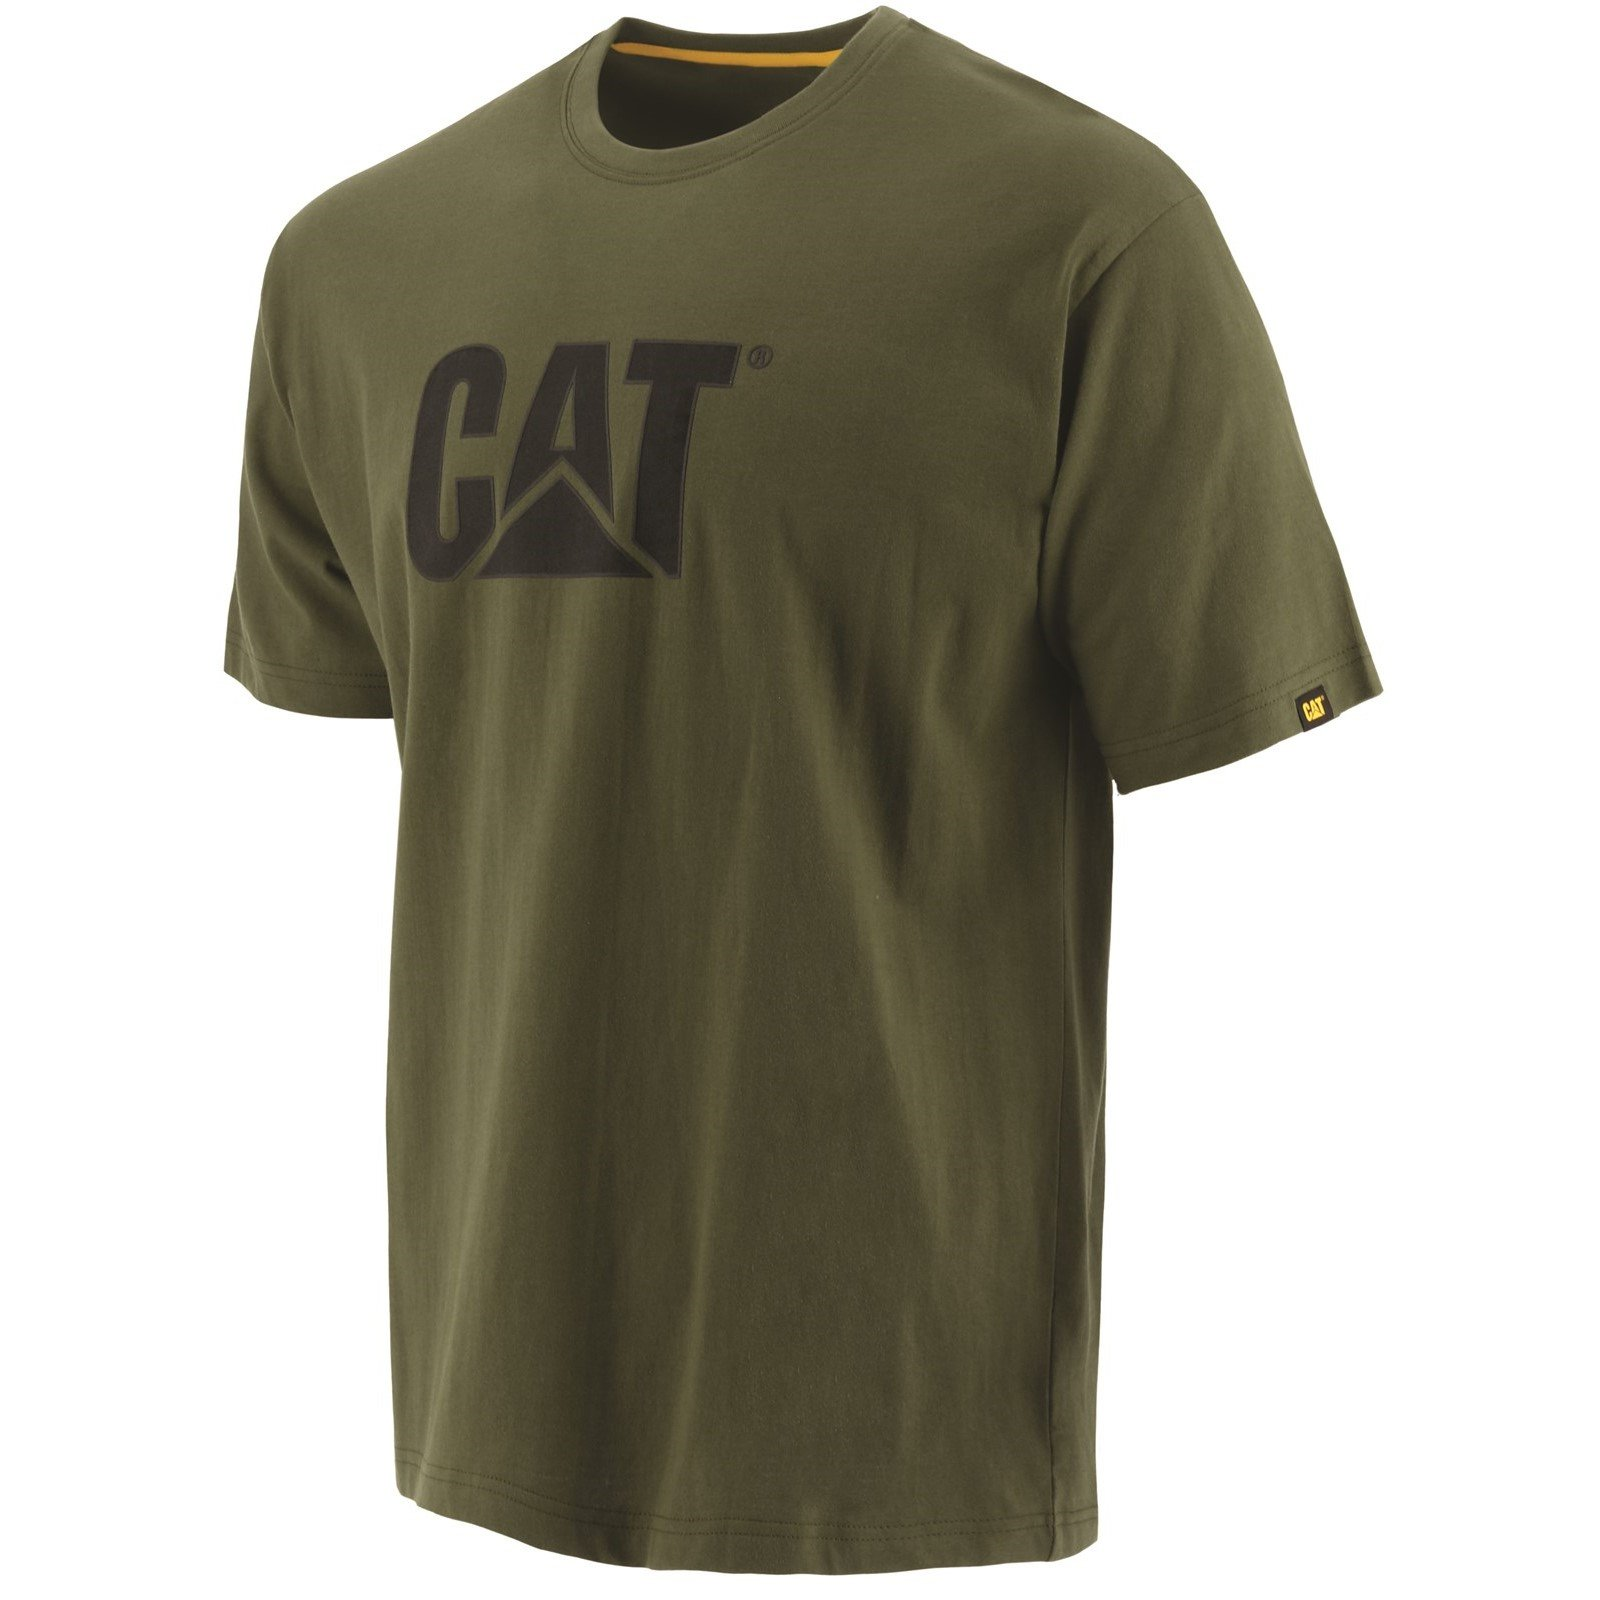 Caterpillar Men's Trademark Logo T-Shirt Various Colours 25301-42086 - Chive Sml